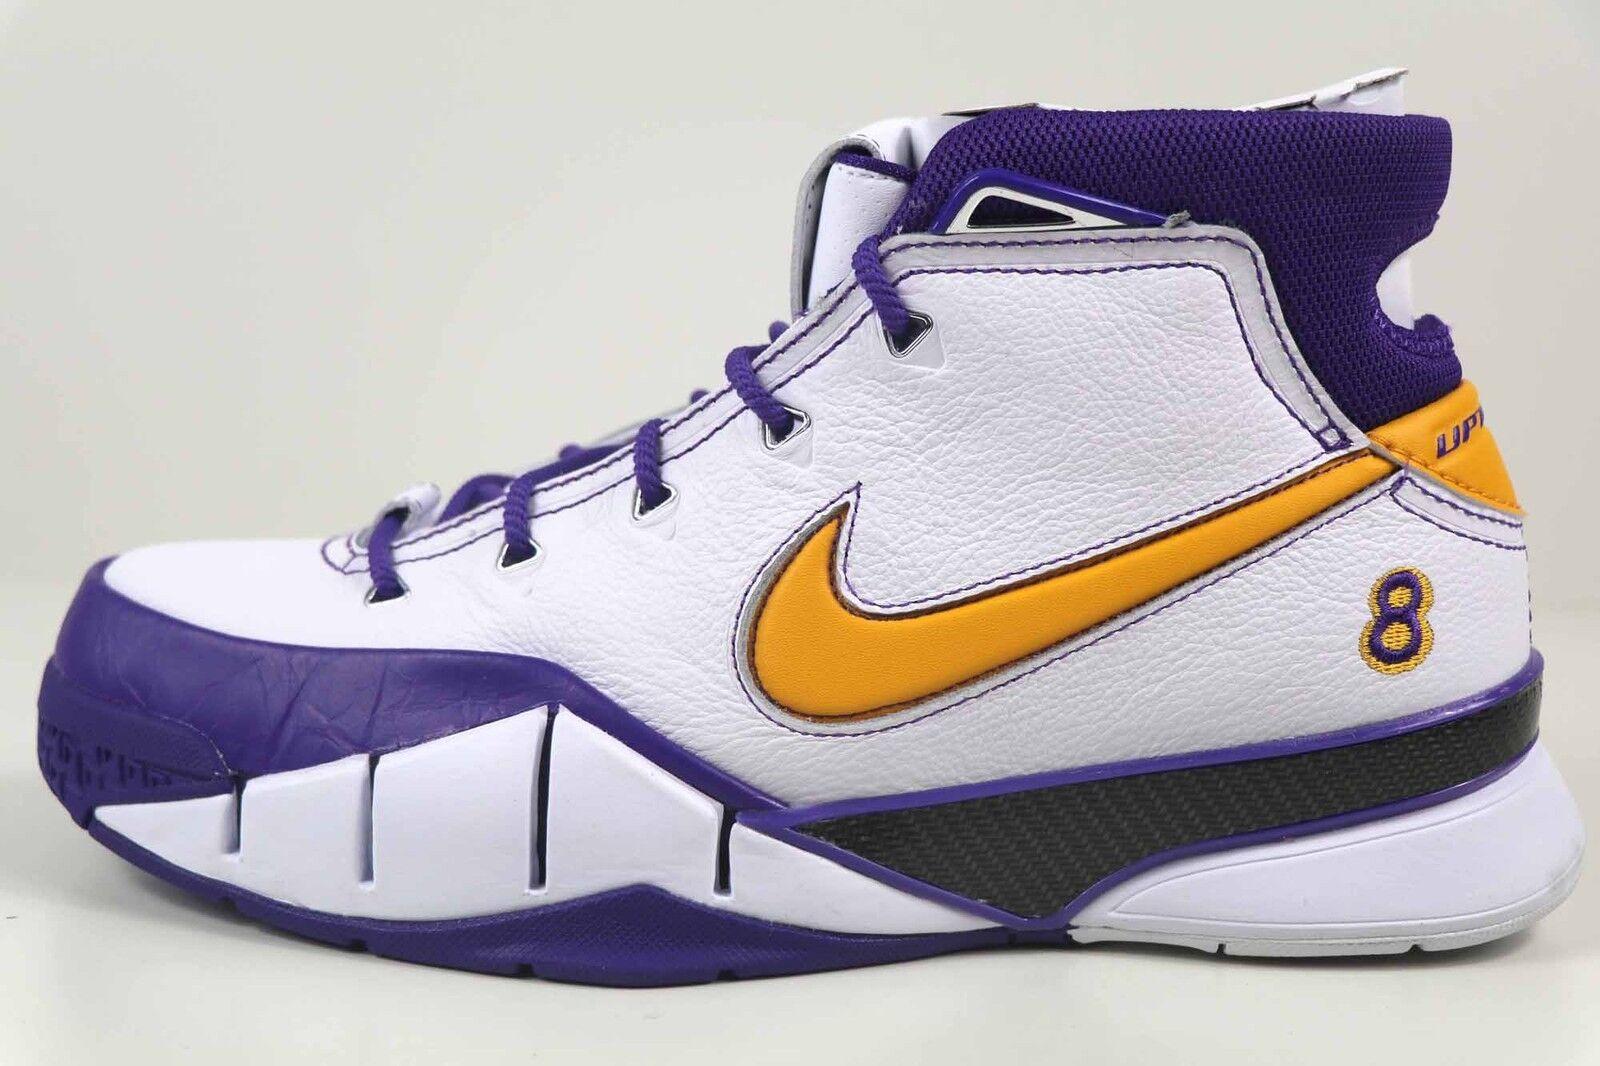 Nike Kobe 1 Predro White Del Sol Varsity Purple Final AQ2728 101 New